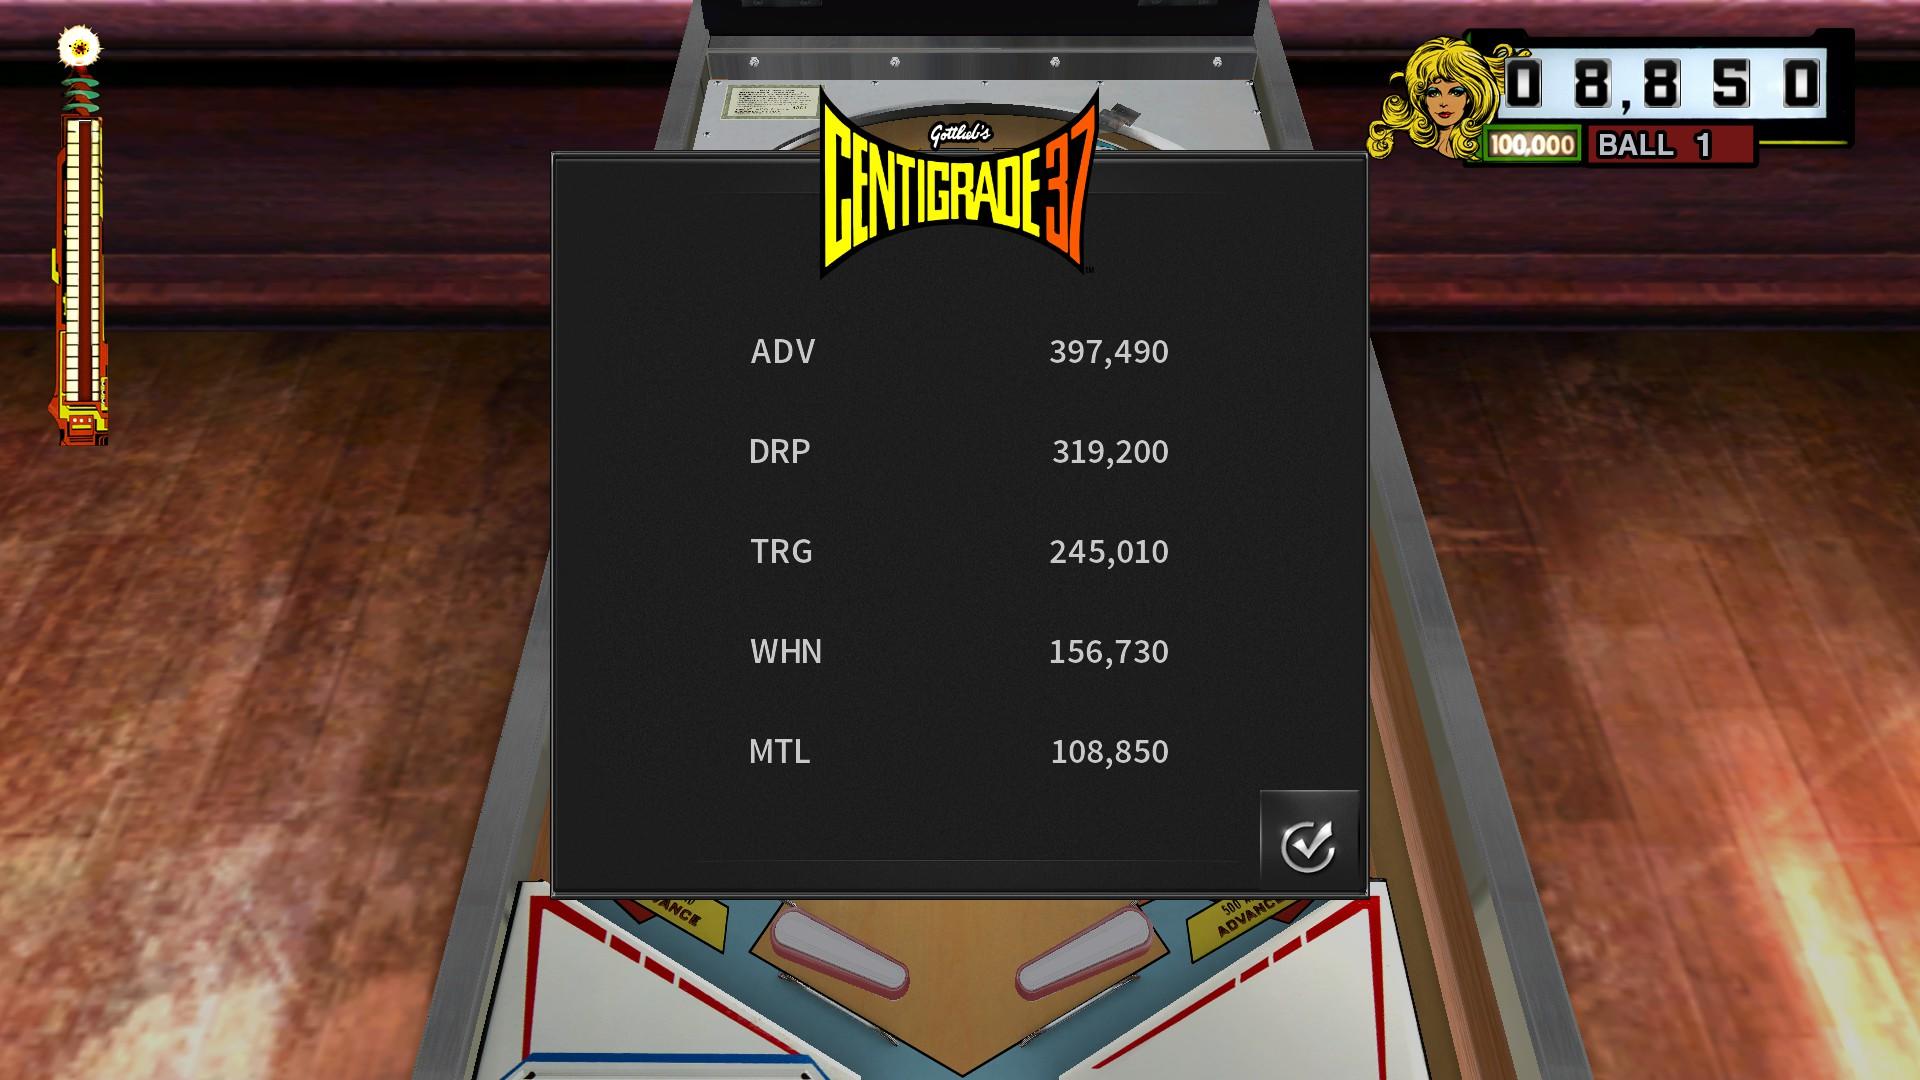 Mantalow: Pinball Arcade: Centigrade 37 (PC) 108,850 points on 2016-12-03 03:56:08